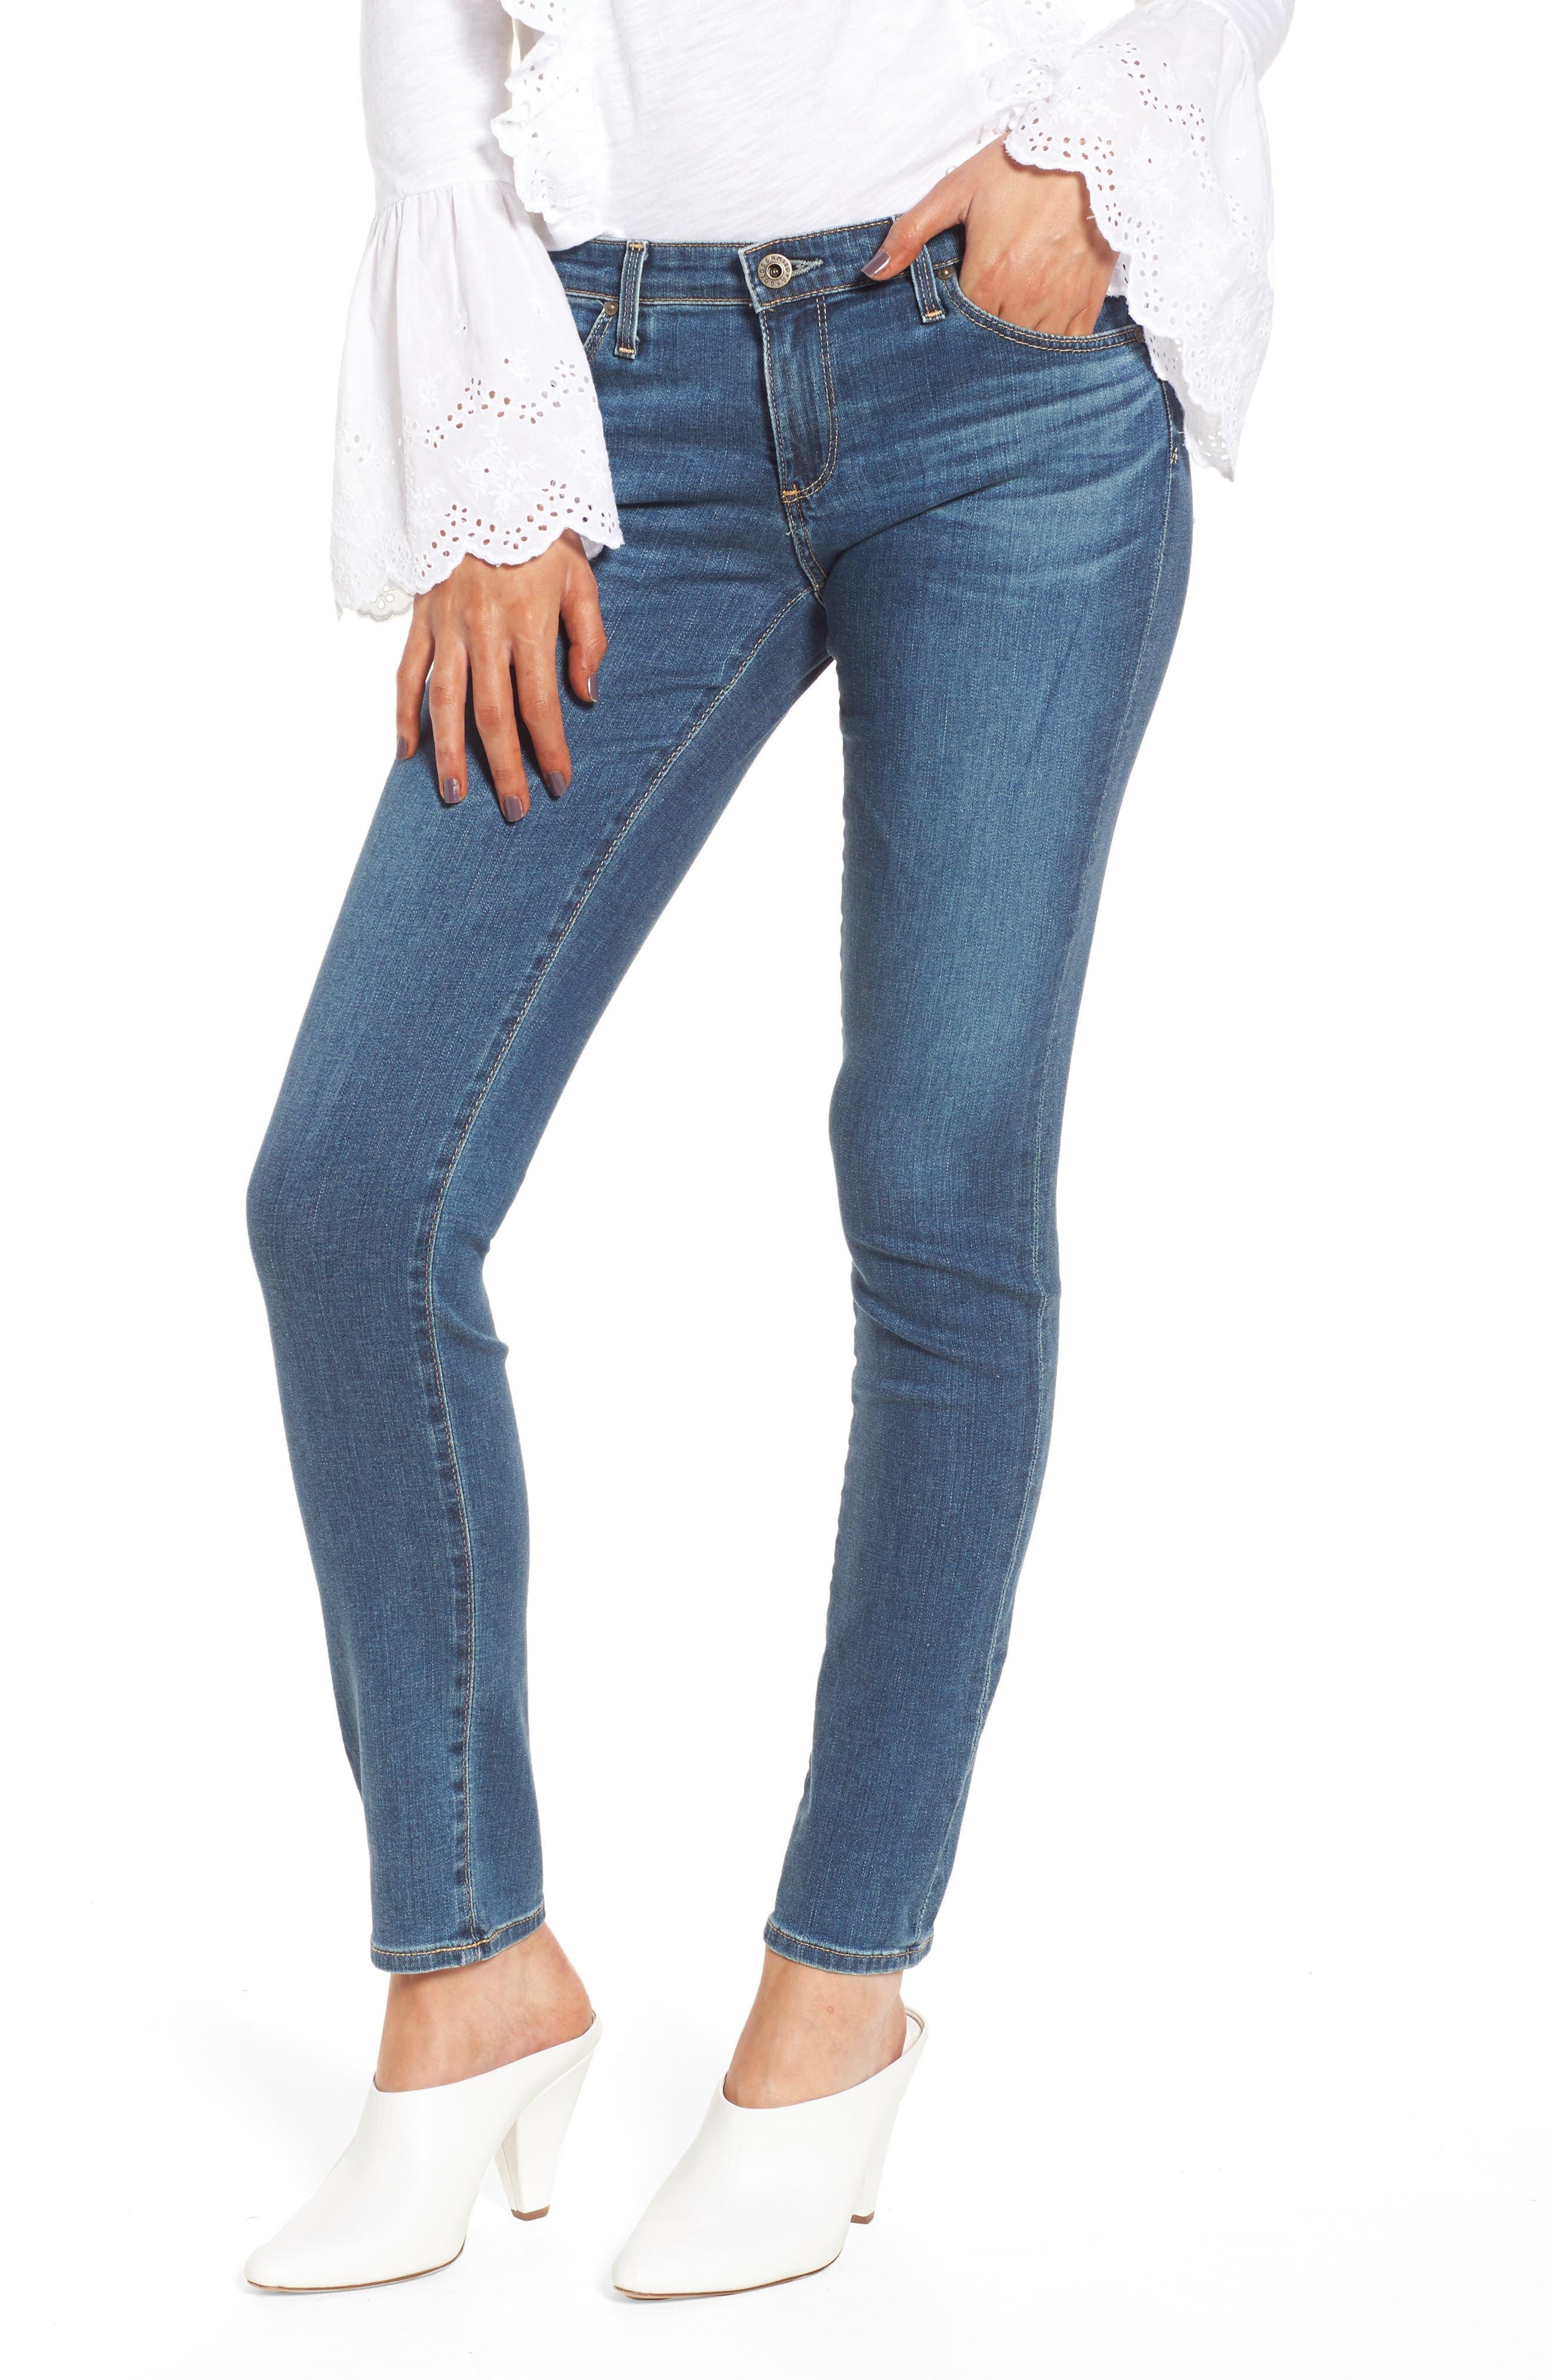 Main Image - AG The Stilt Cigarette Leg Jeans (Serendipitous)